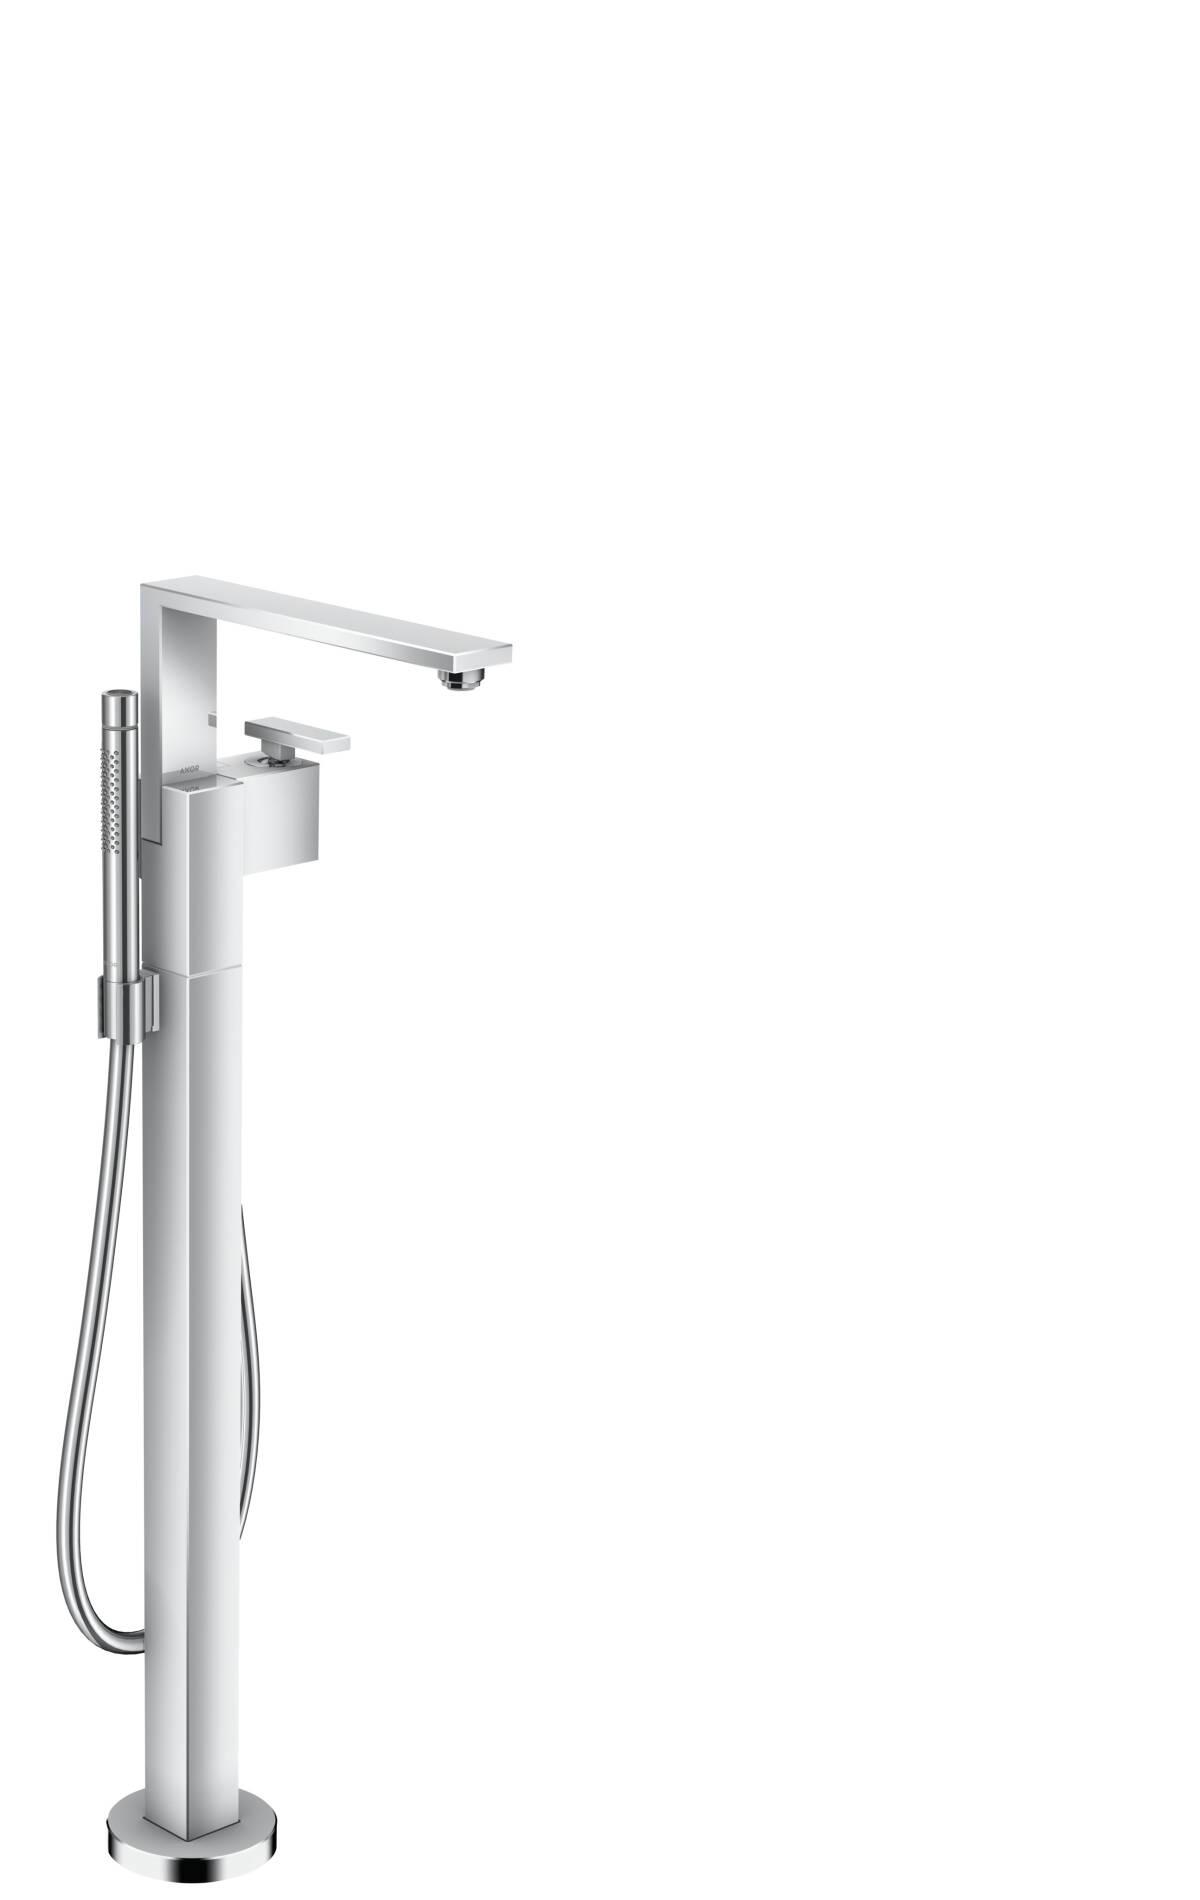 Single lever bath mixer floor-standing, Chrome, 46440000